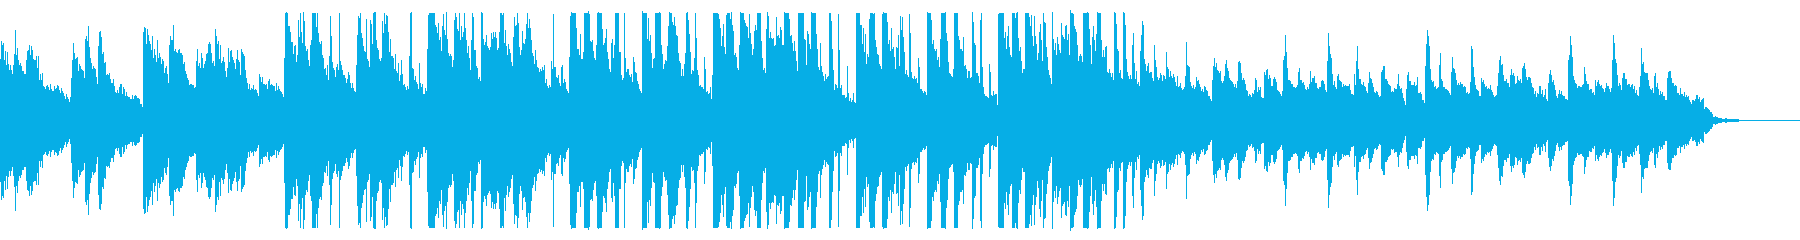 Neosoul CAFE BARの再生済みの波形